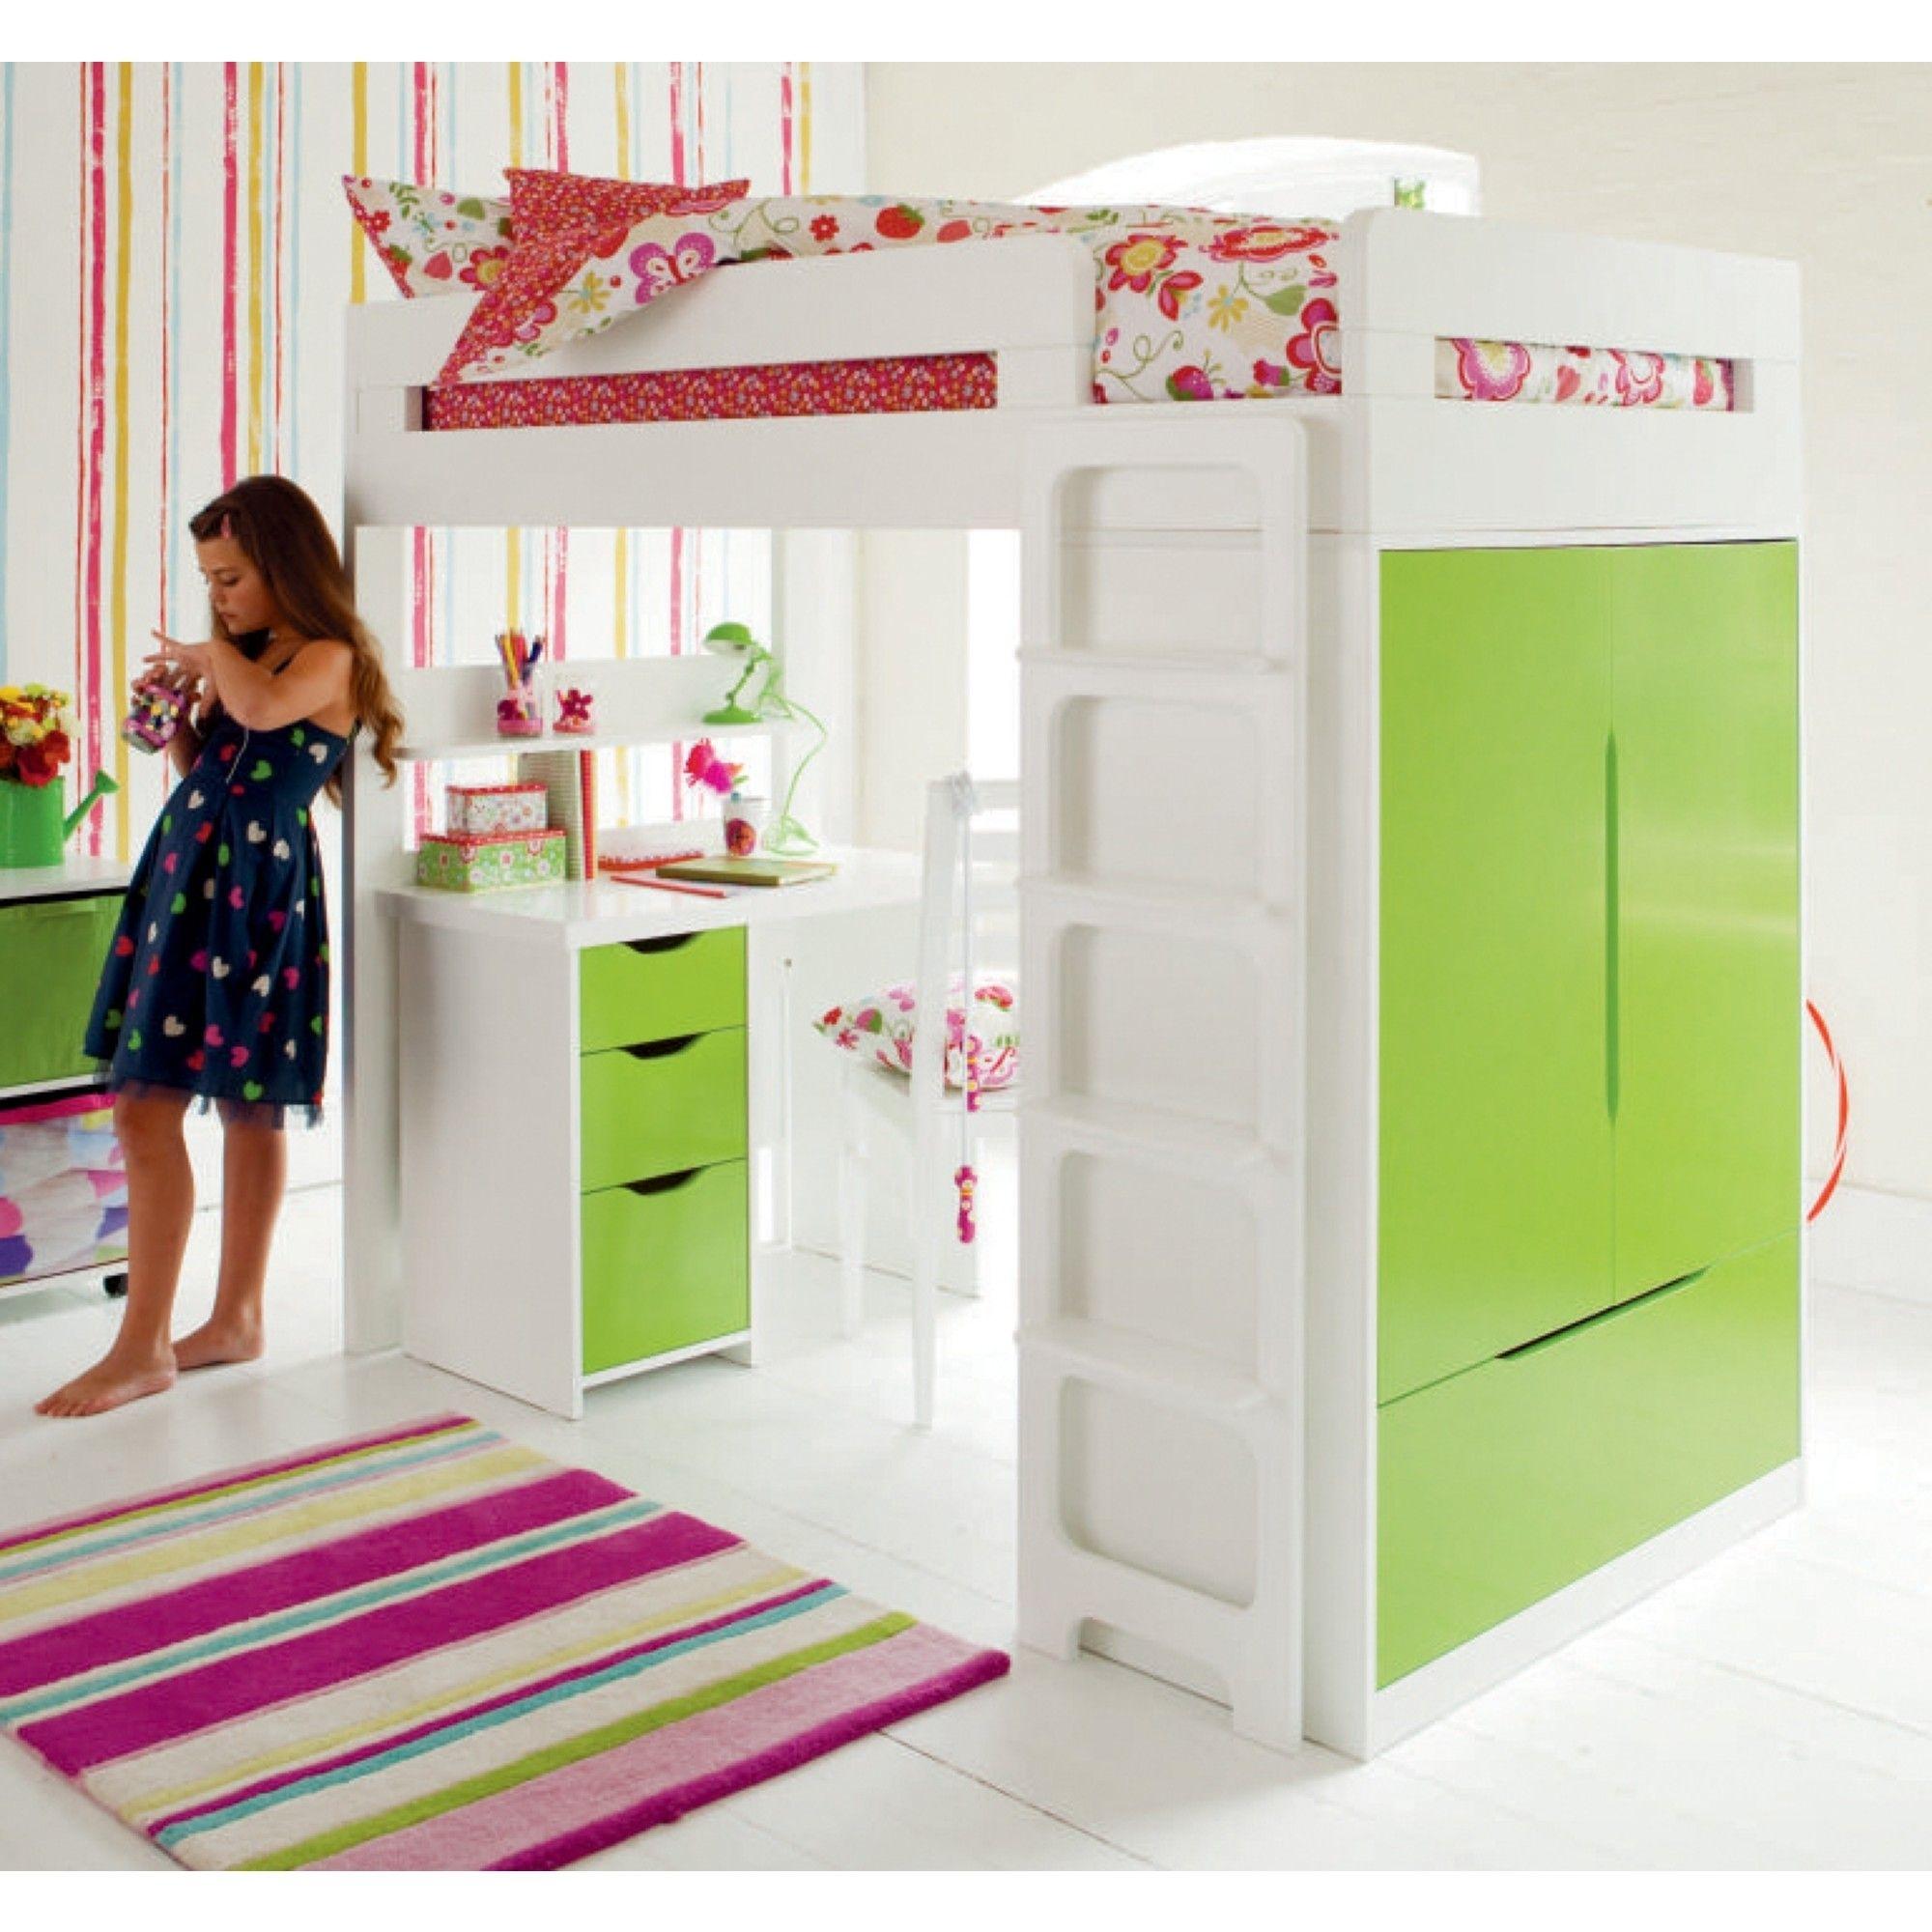 Image of: Kids Loft Bed With Desk Underneath Ideas On Foter